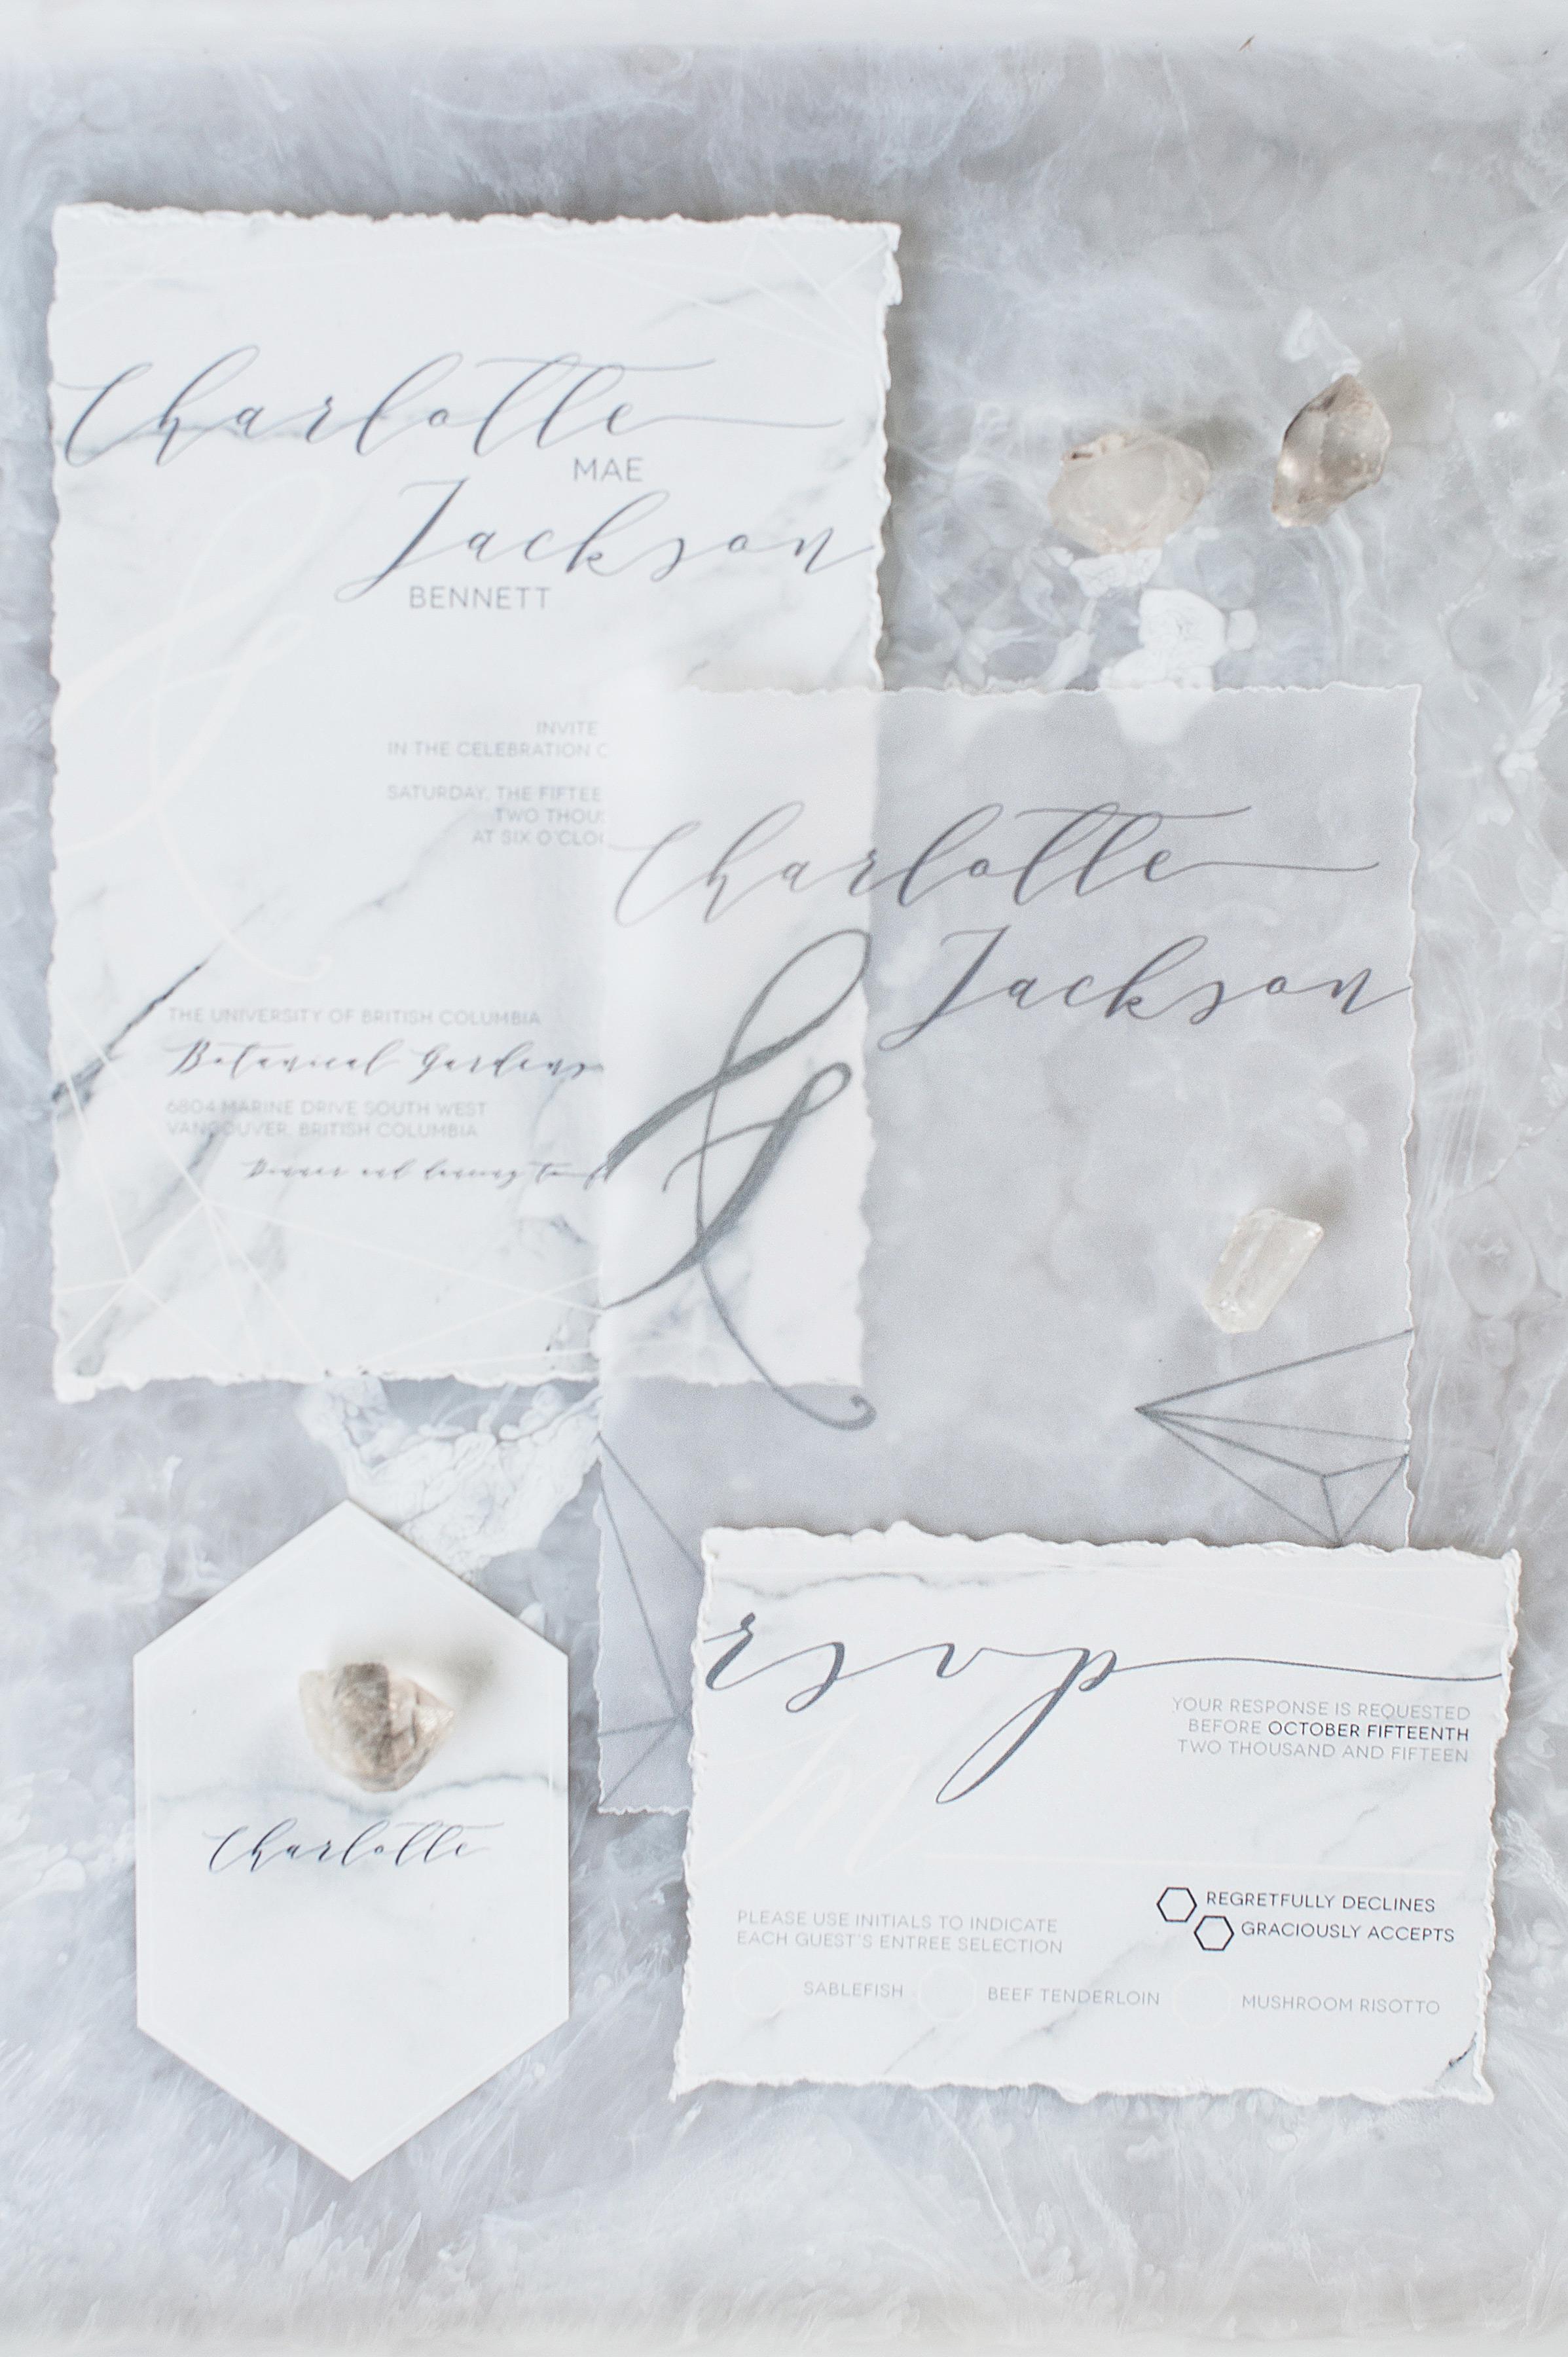 deckle edge invitations blush wedding photography